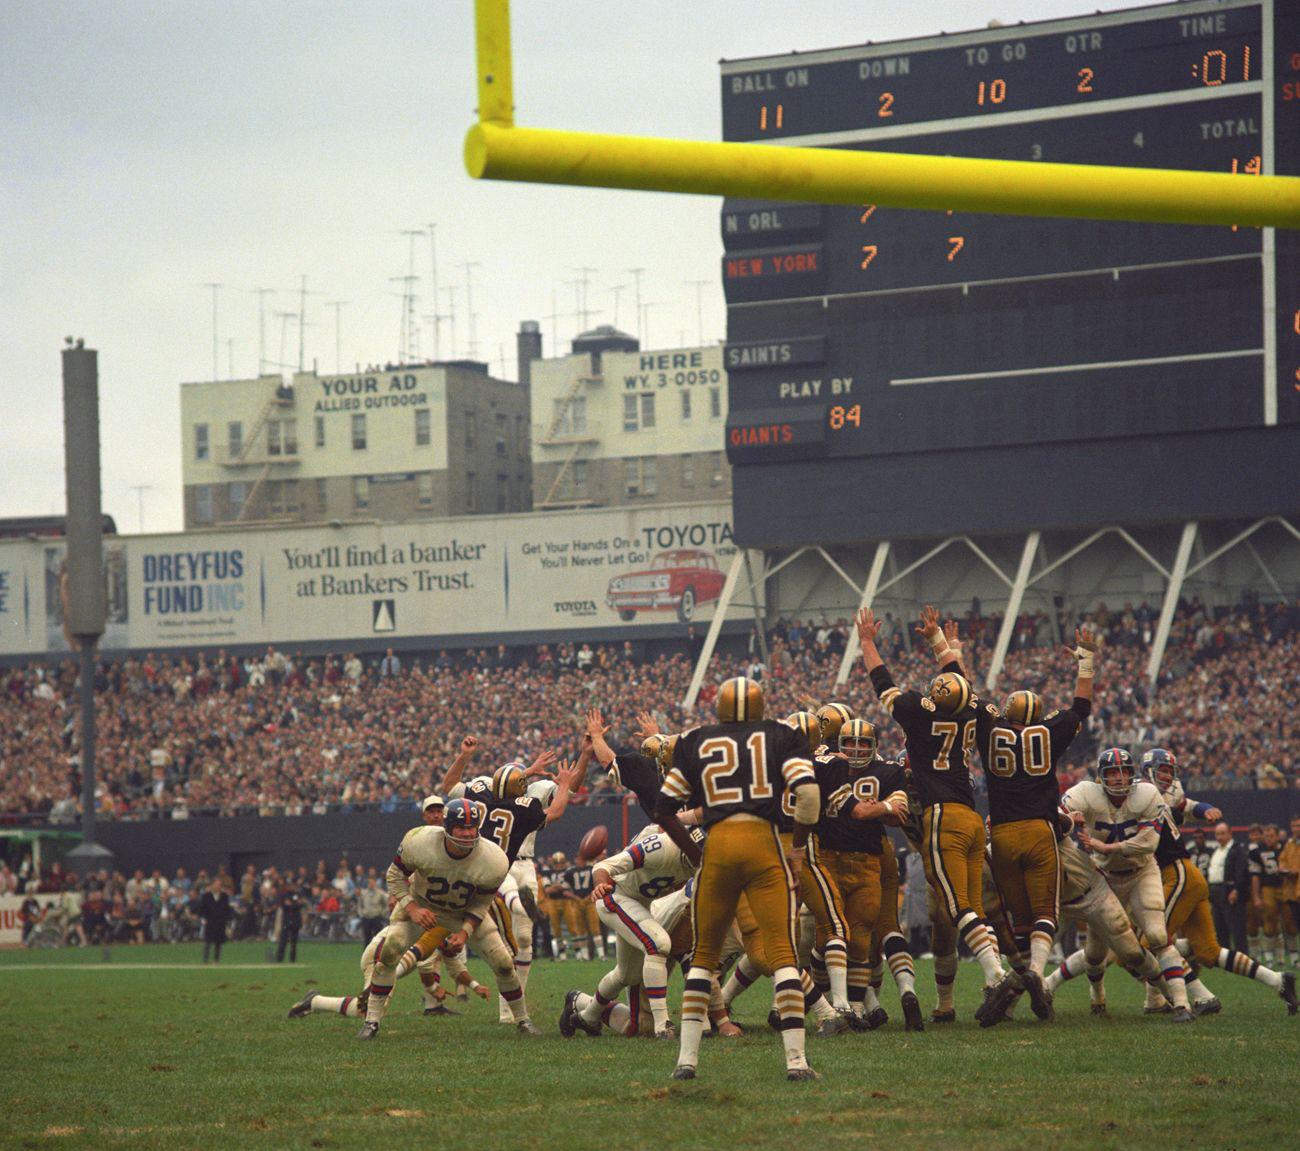 Giants Vs Saints Nfl Football Stadium New York Giants Football Nfl Football Teams